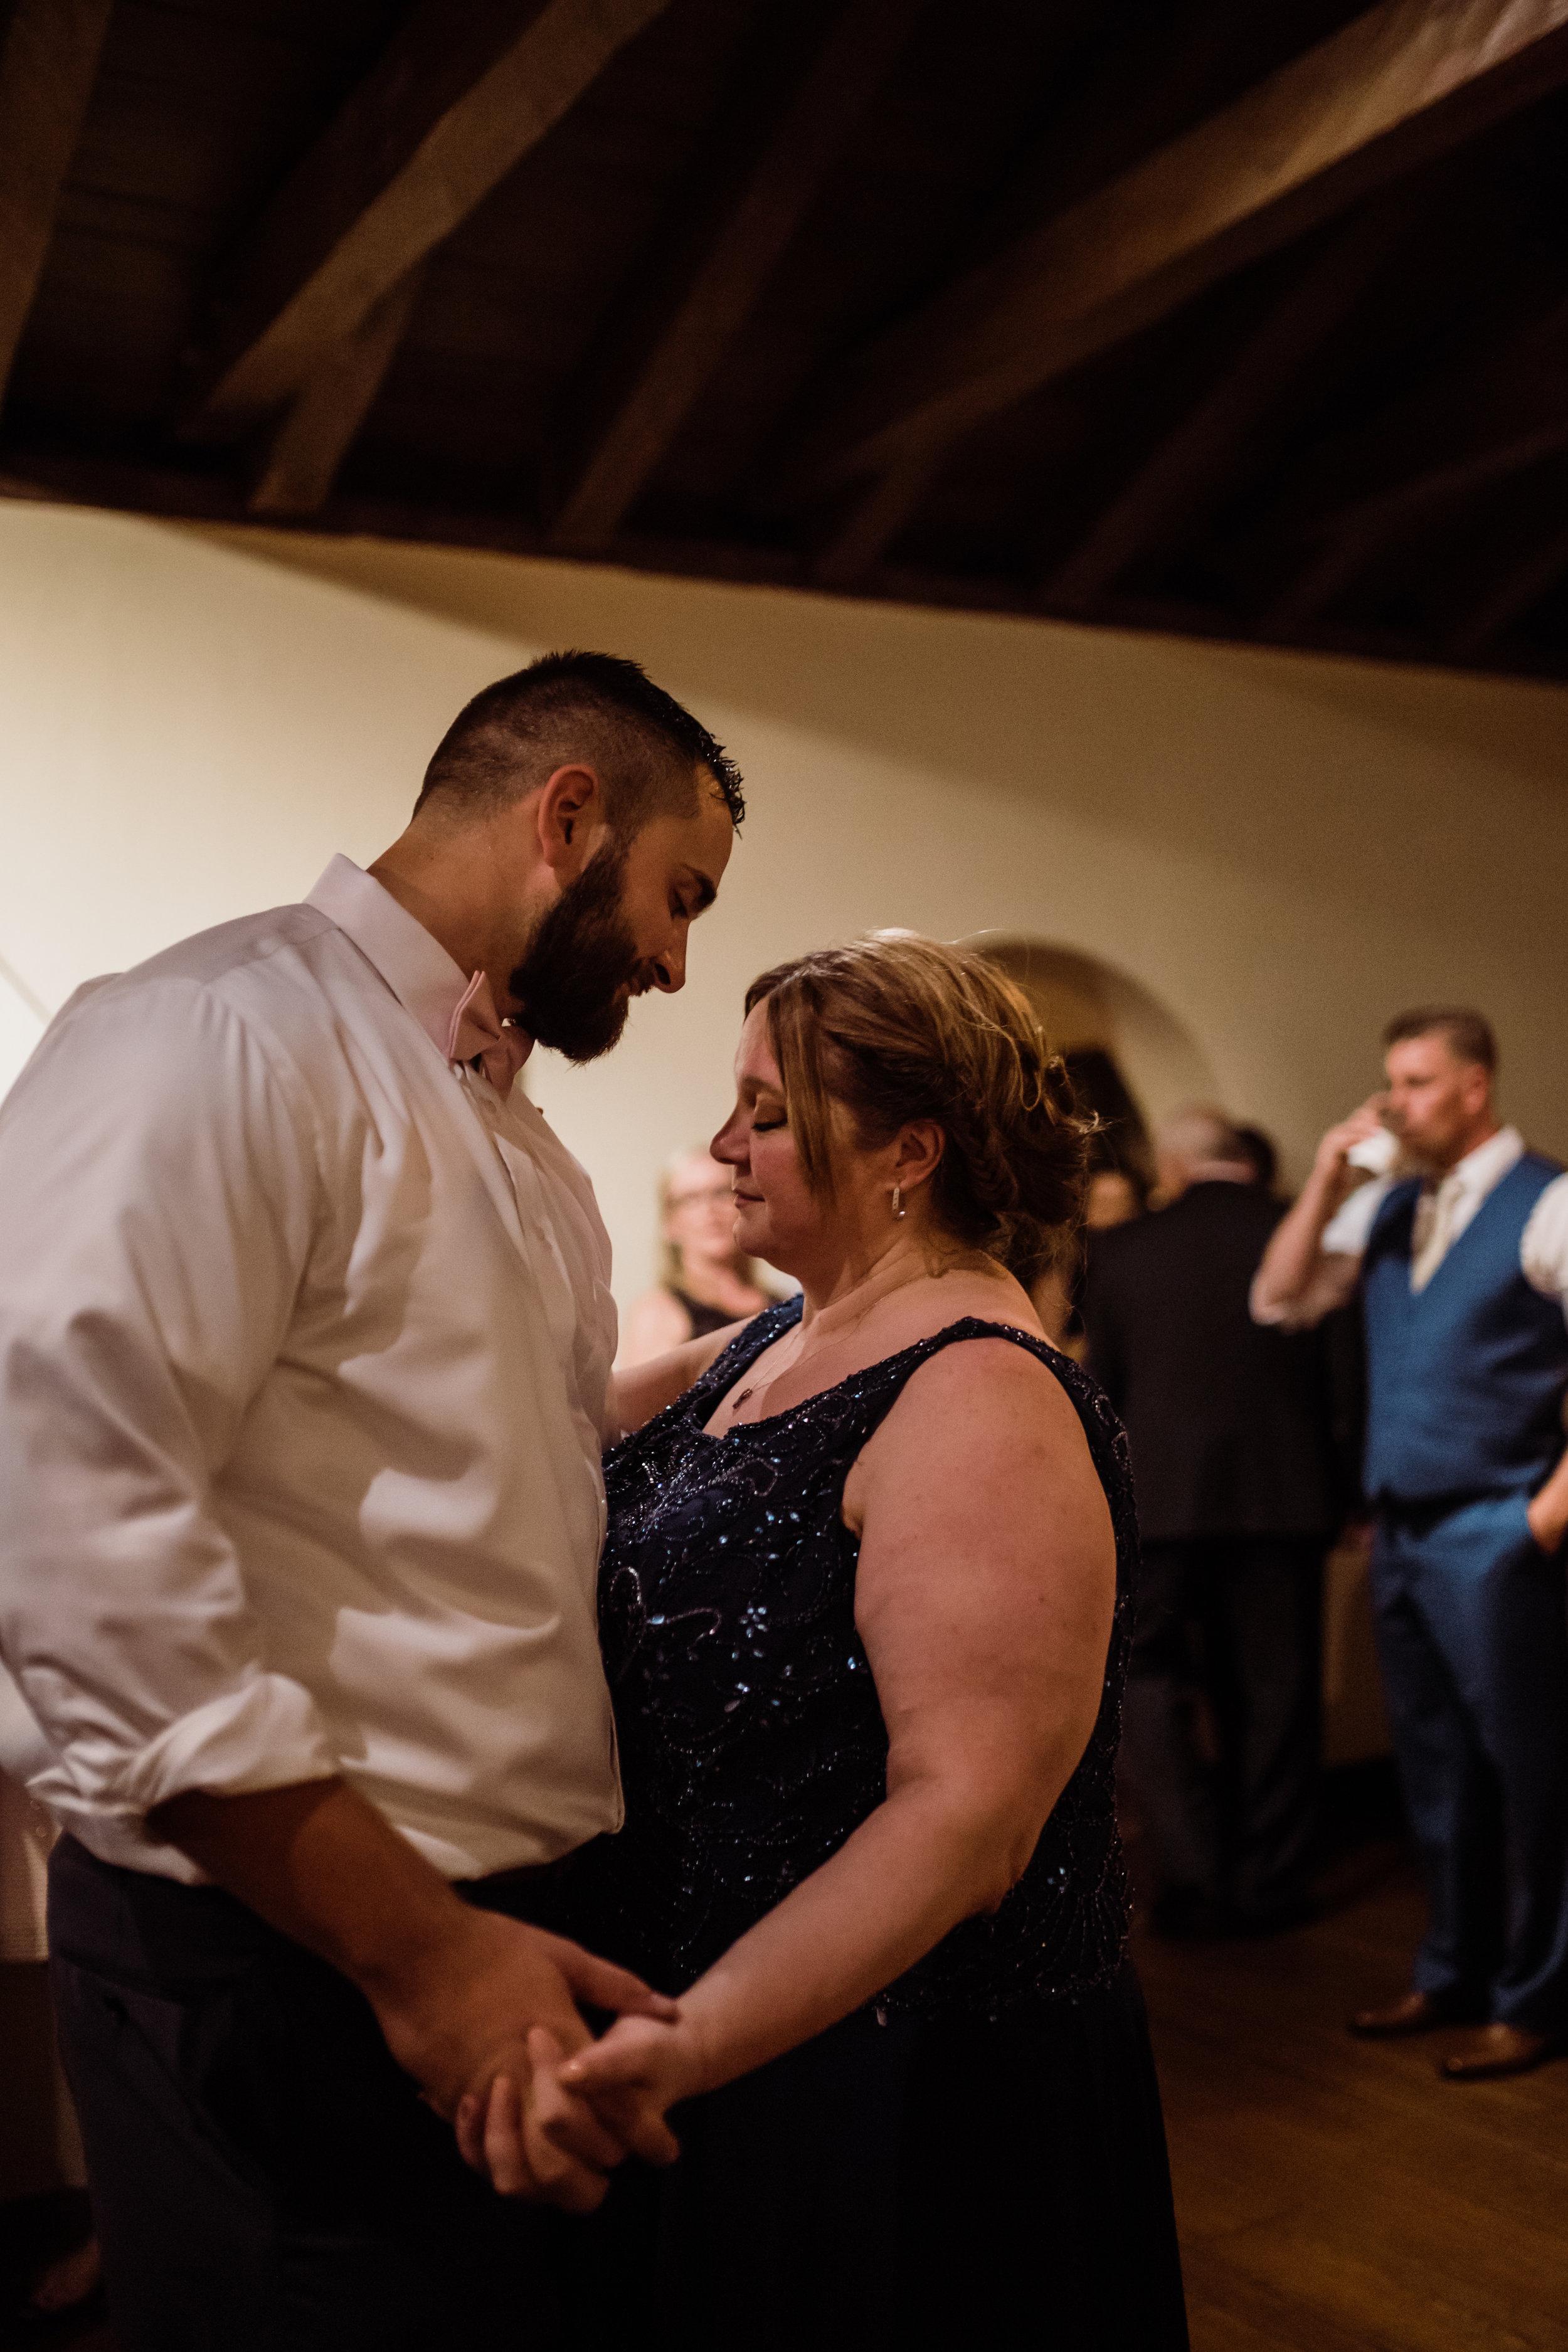 2017.10.15 Steffi and Elliott Simmonds Casa Feliz Wedding (825 of 969).jpg